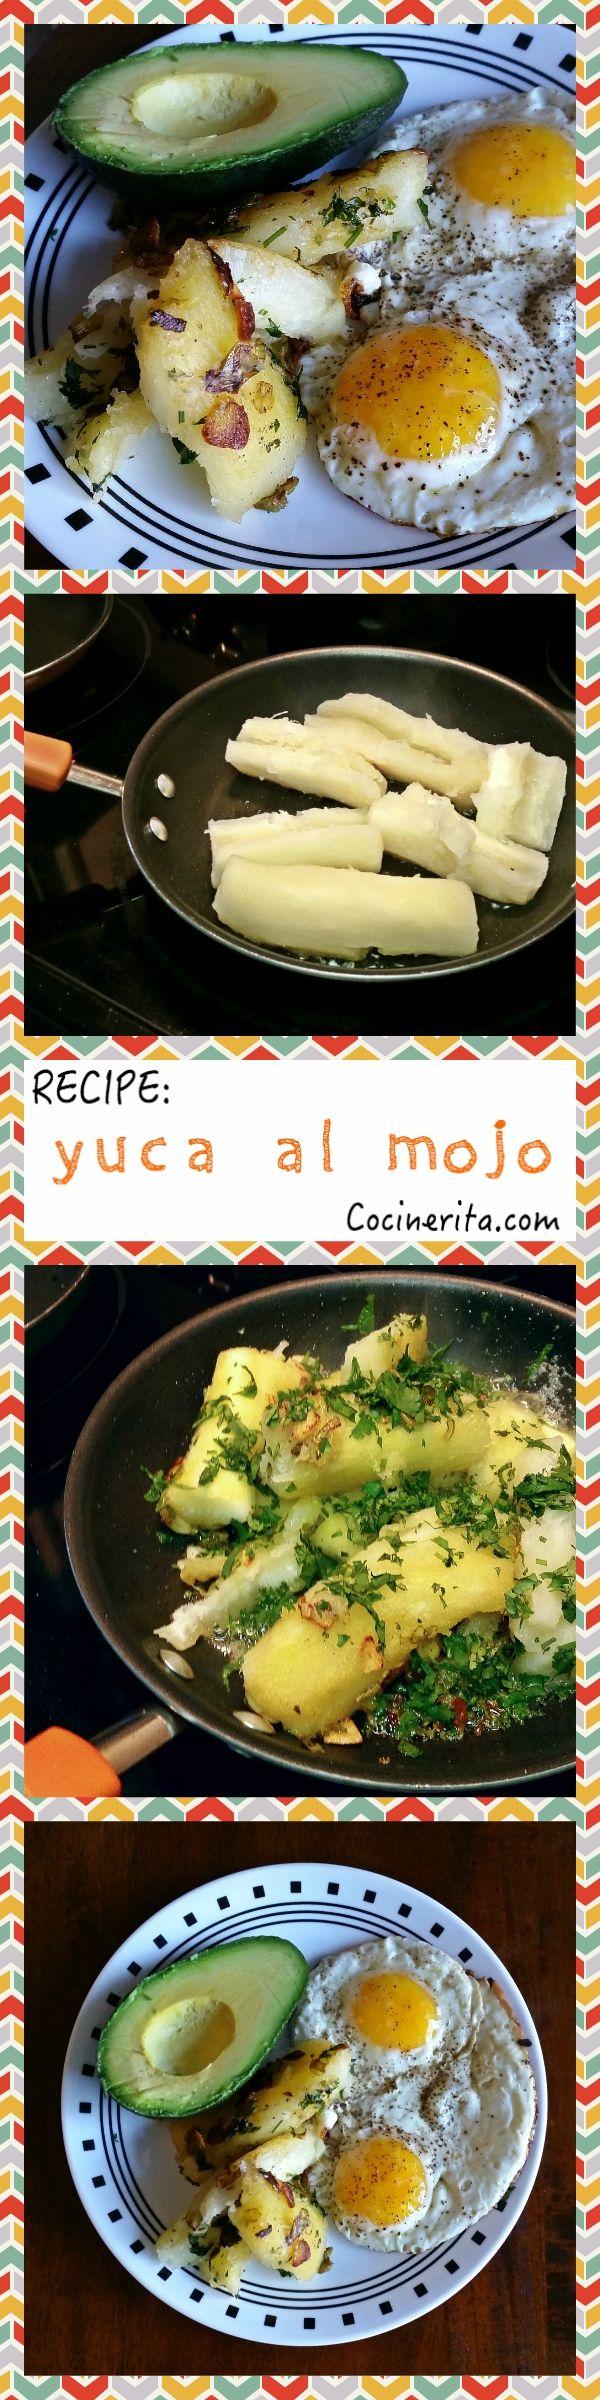 15 best panama food recipes images on pinterest cooking food recipe receta de yuca al mojo panamanian caribbean food forumfinder Image collections